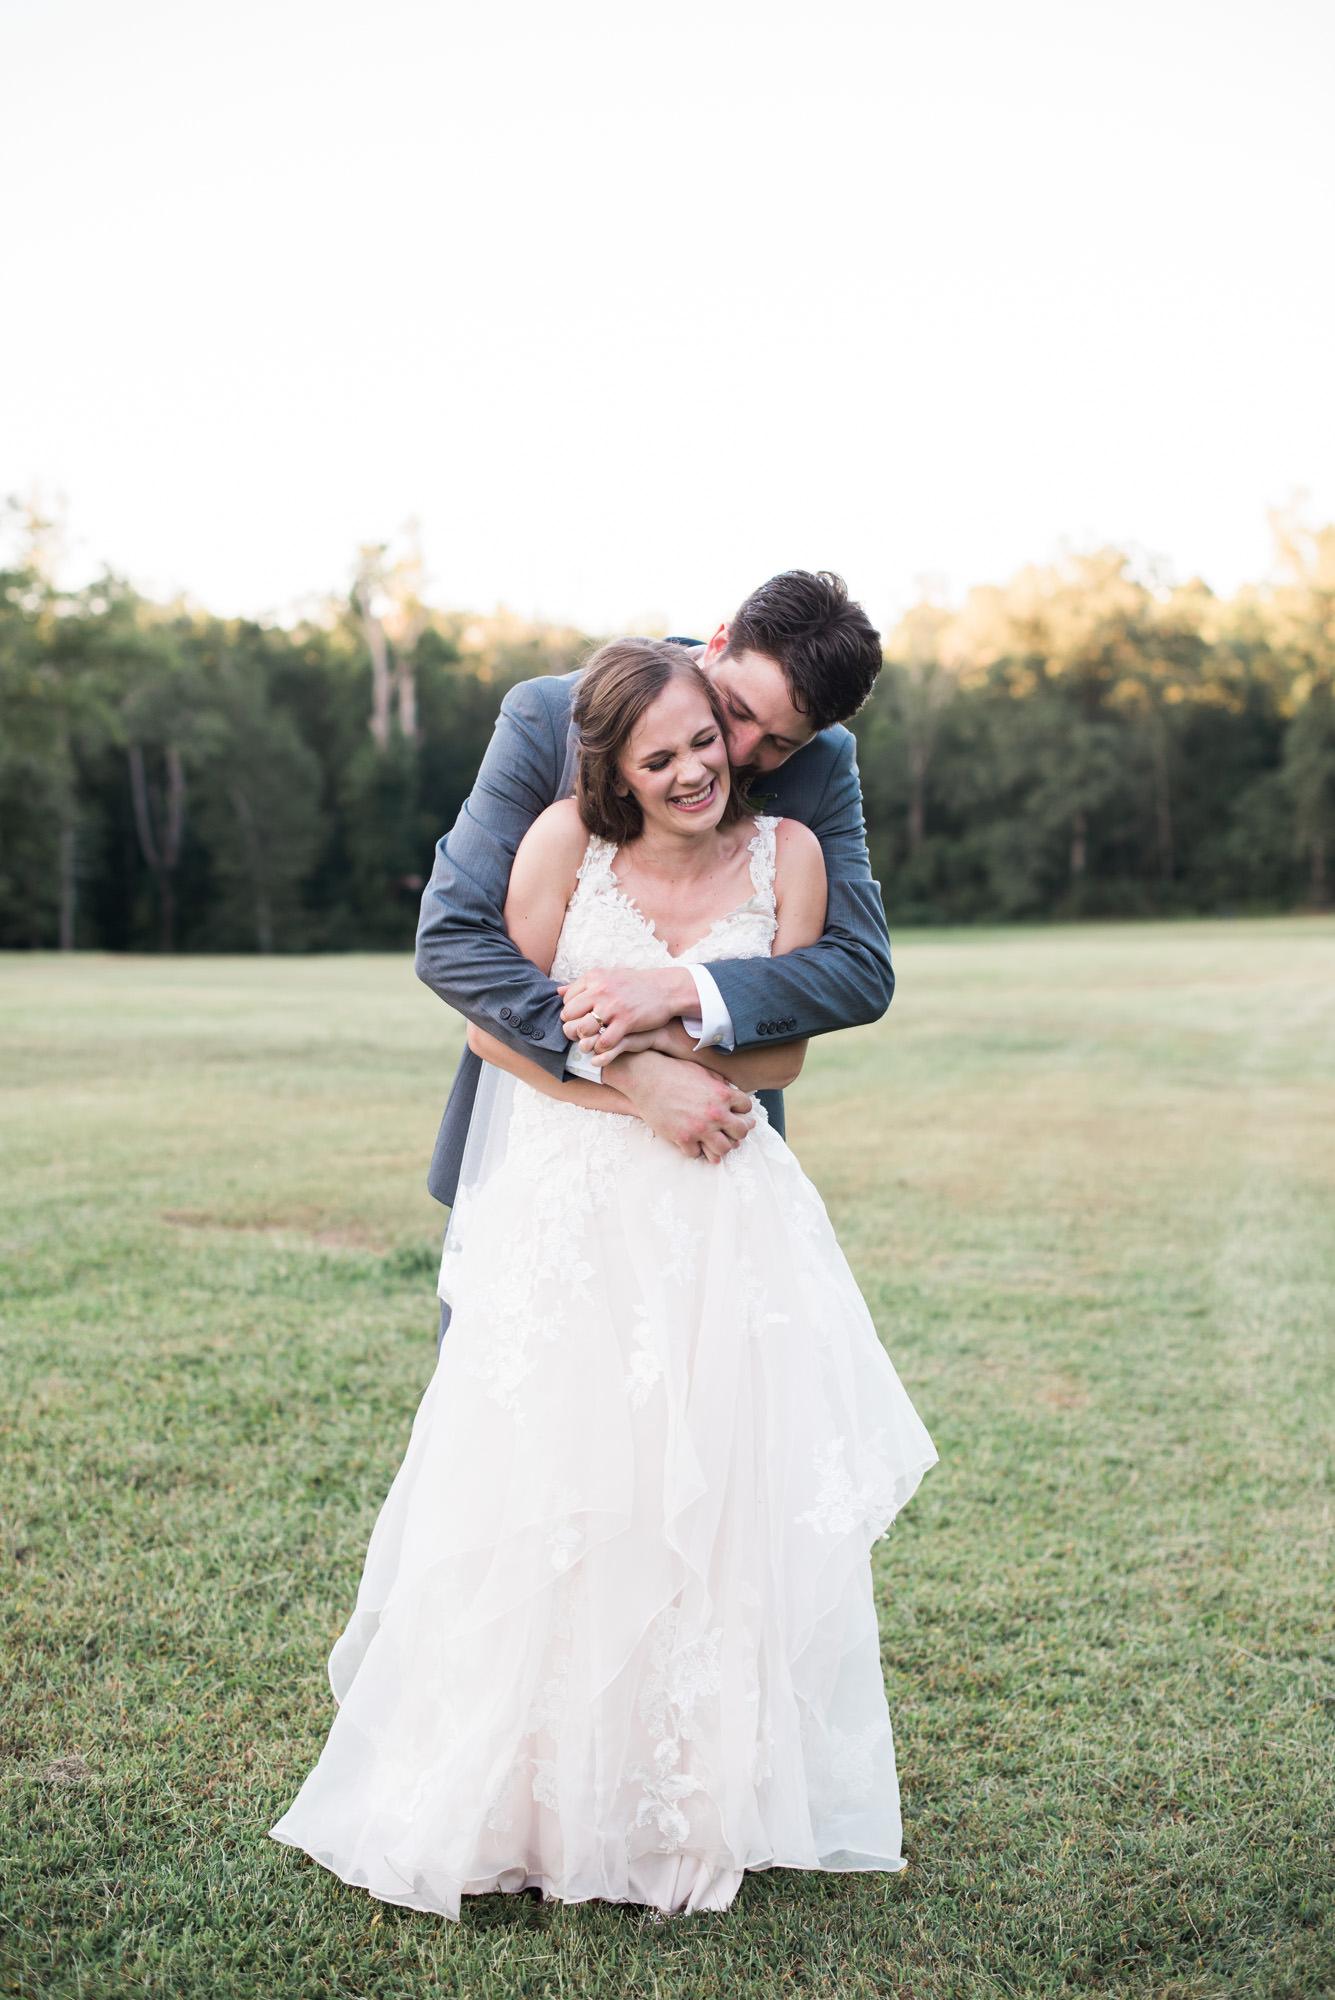 Athens-Georgia-wedding-photography-64.jpg